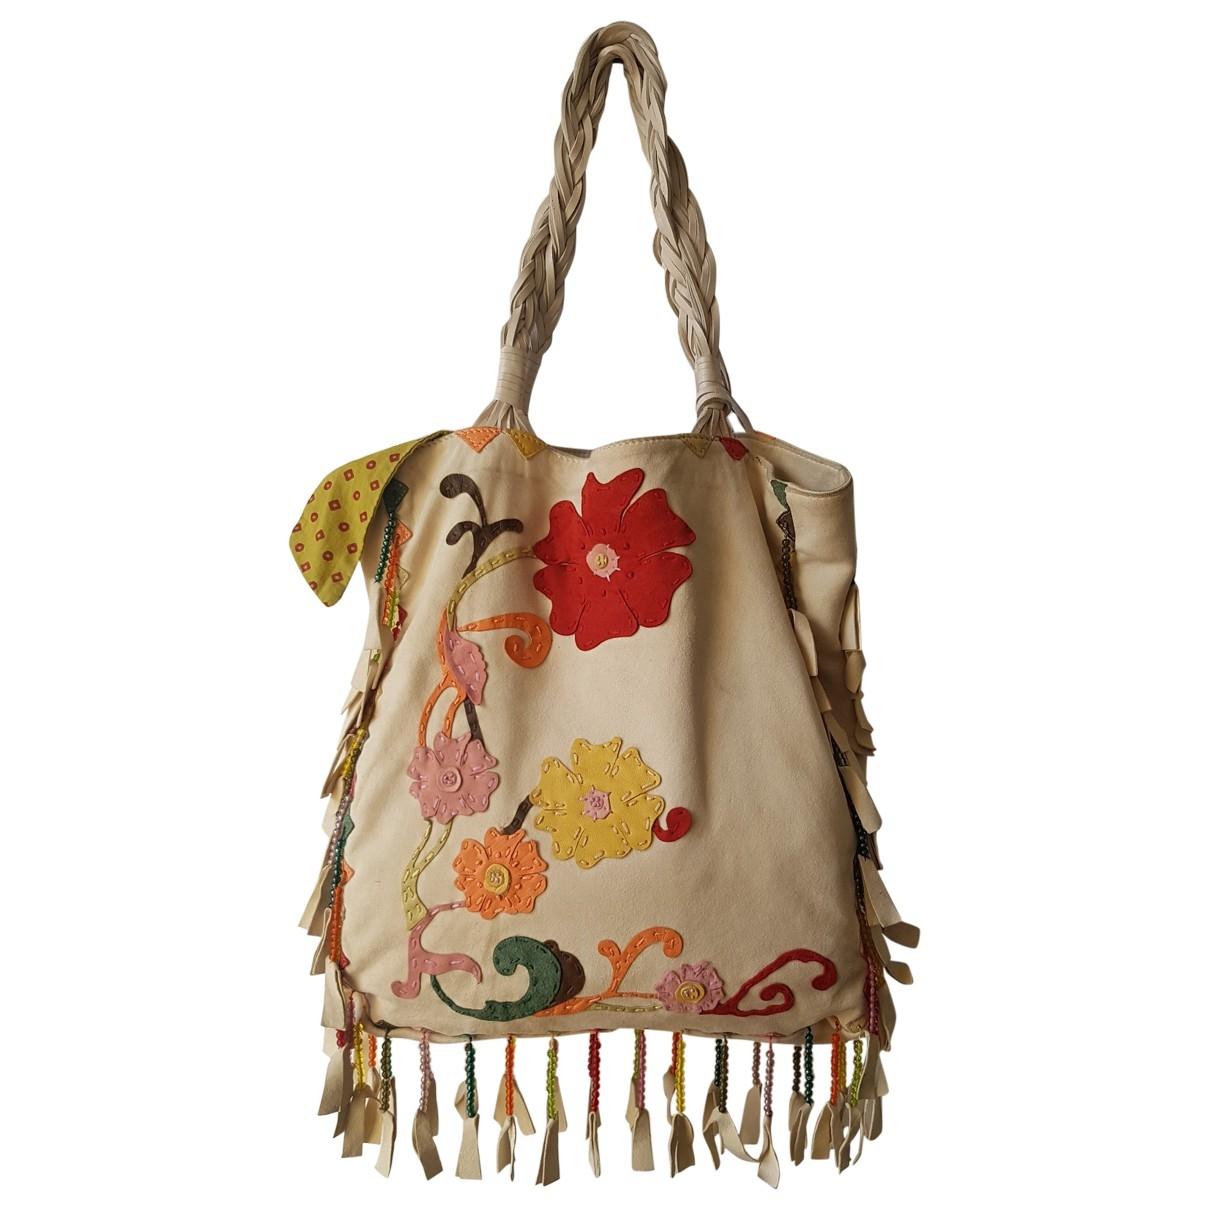 Orciani \N Handtasche in  Beige Veloursleder